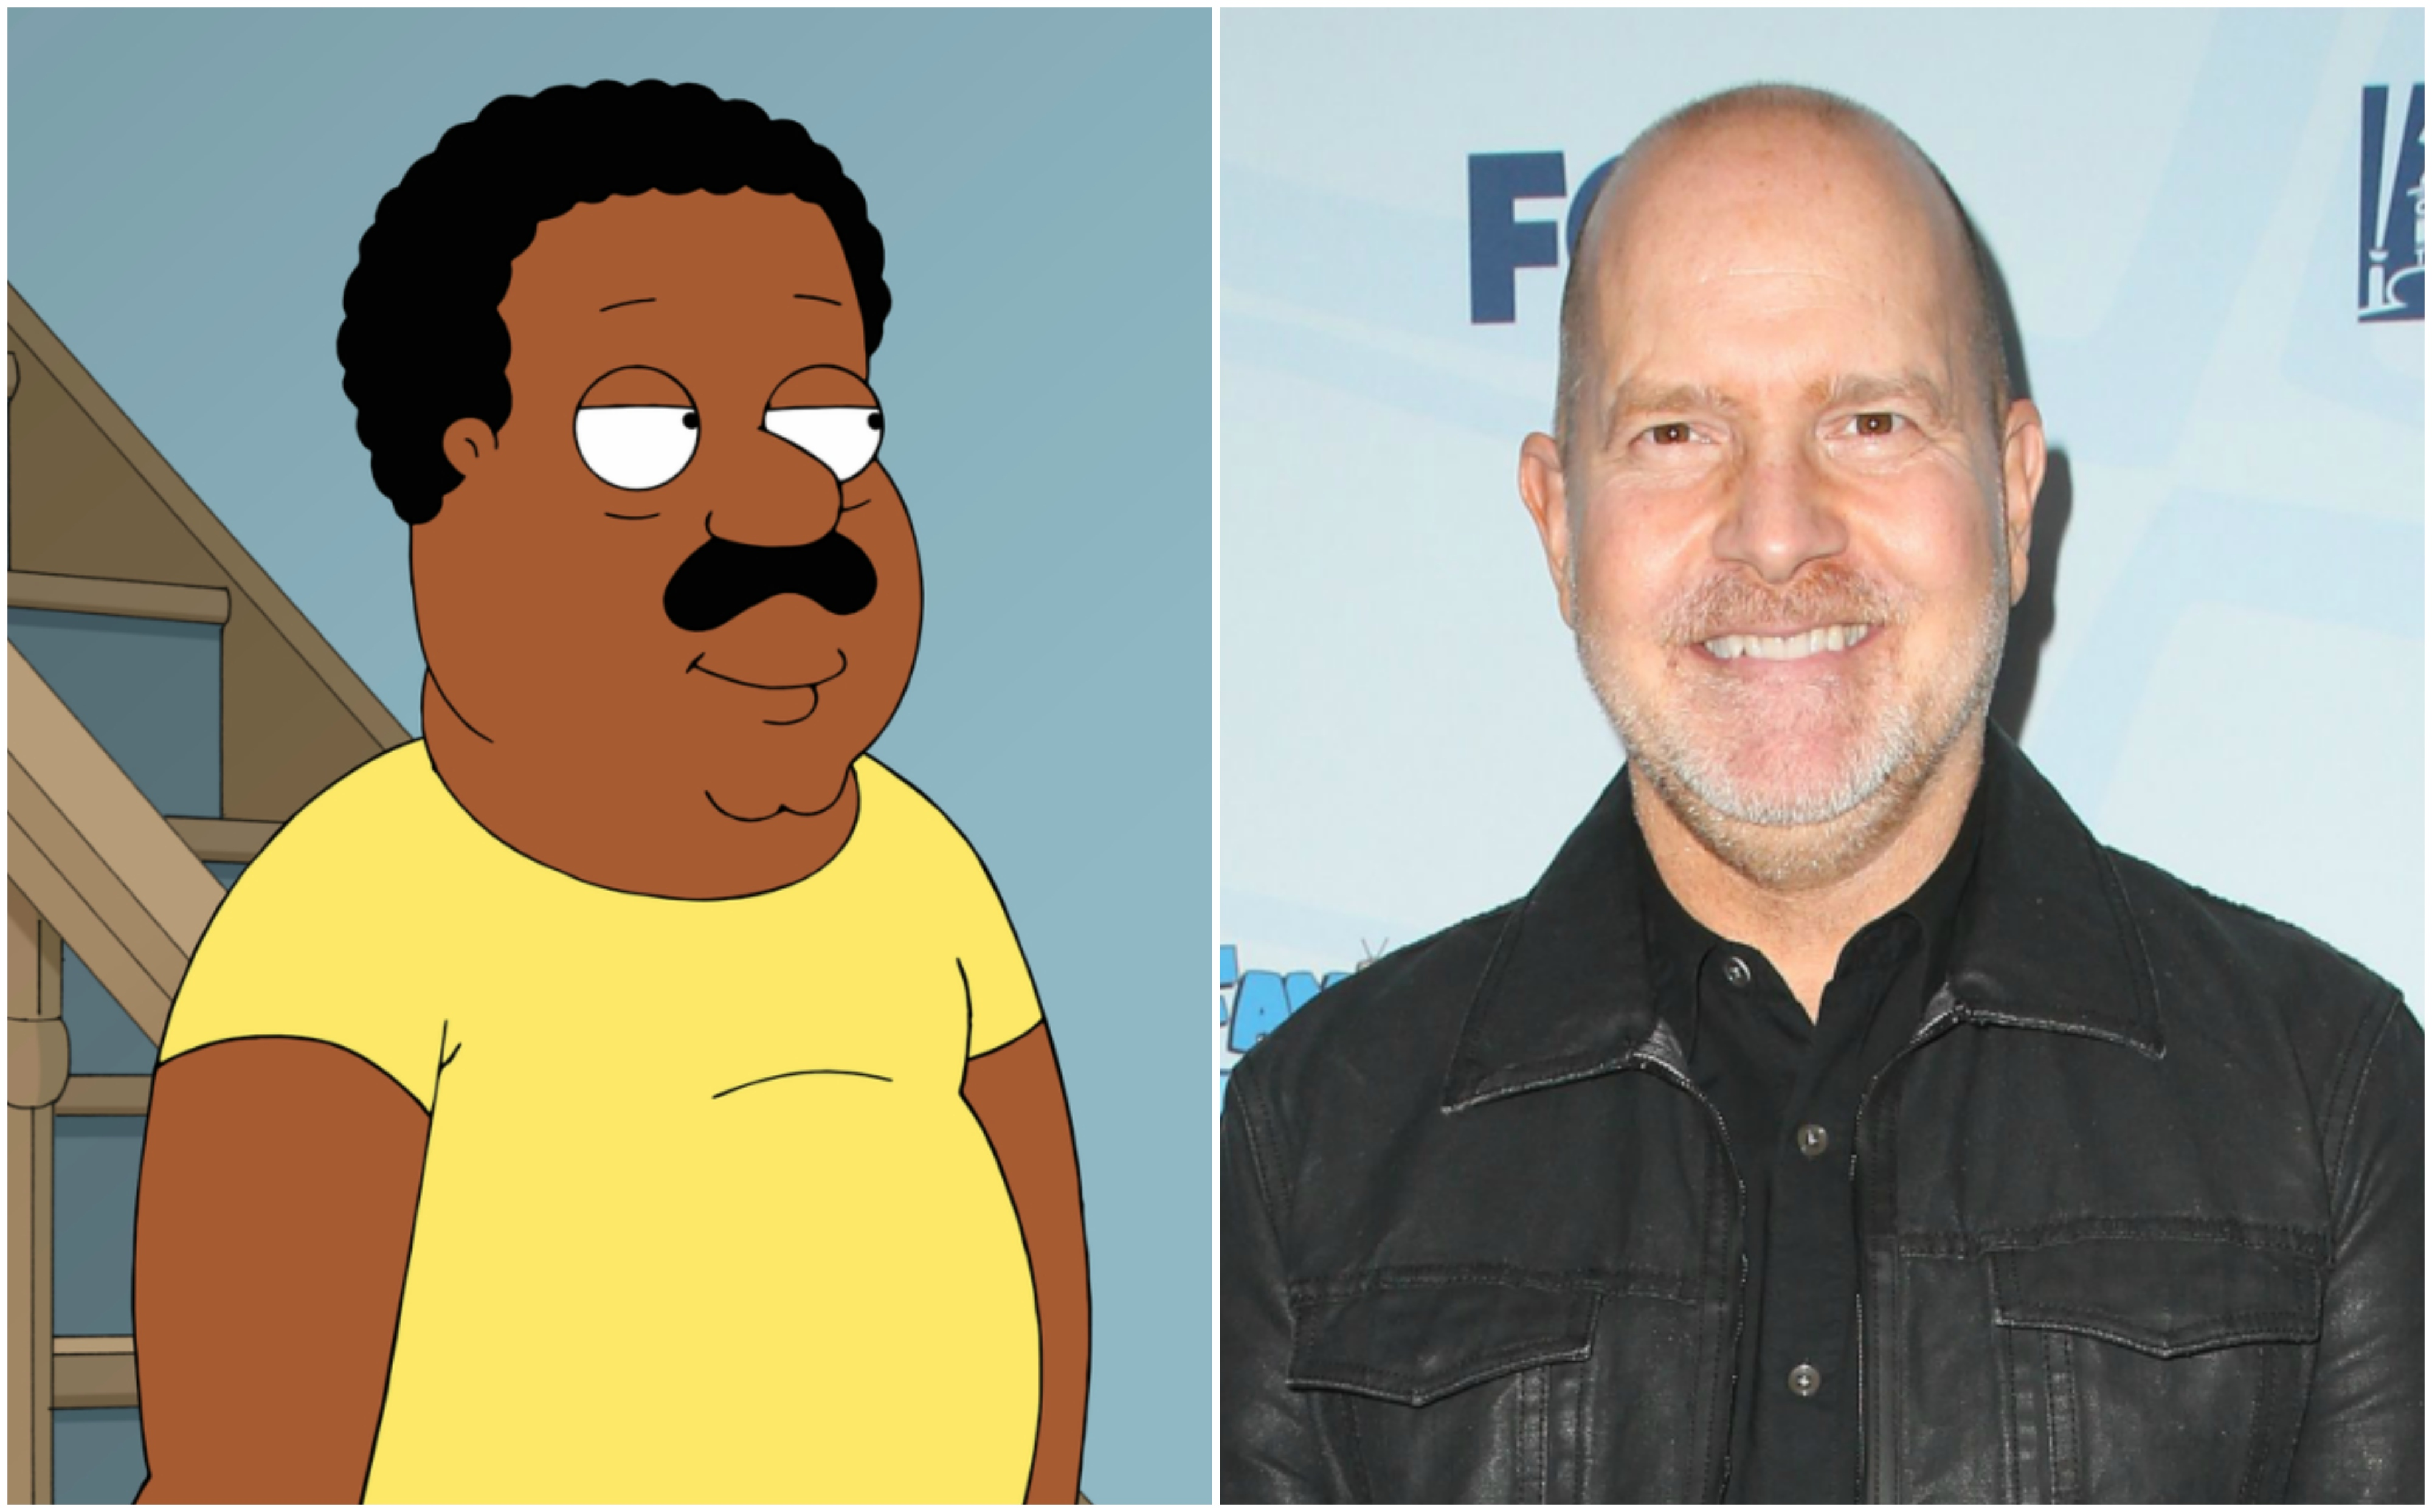 Cartoon Whitewashing: Rick and Morty, BoJack Horseman Aim